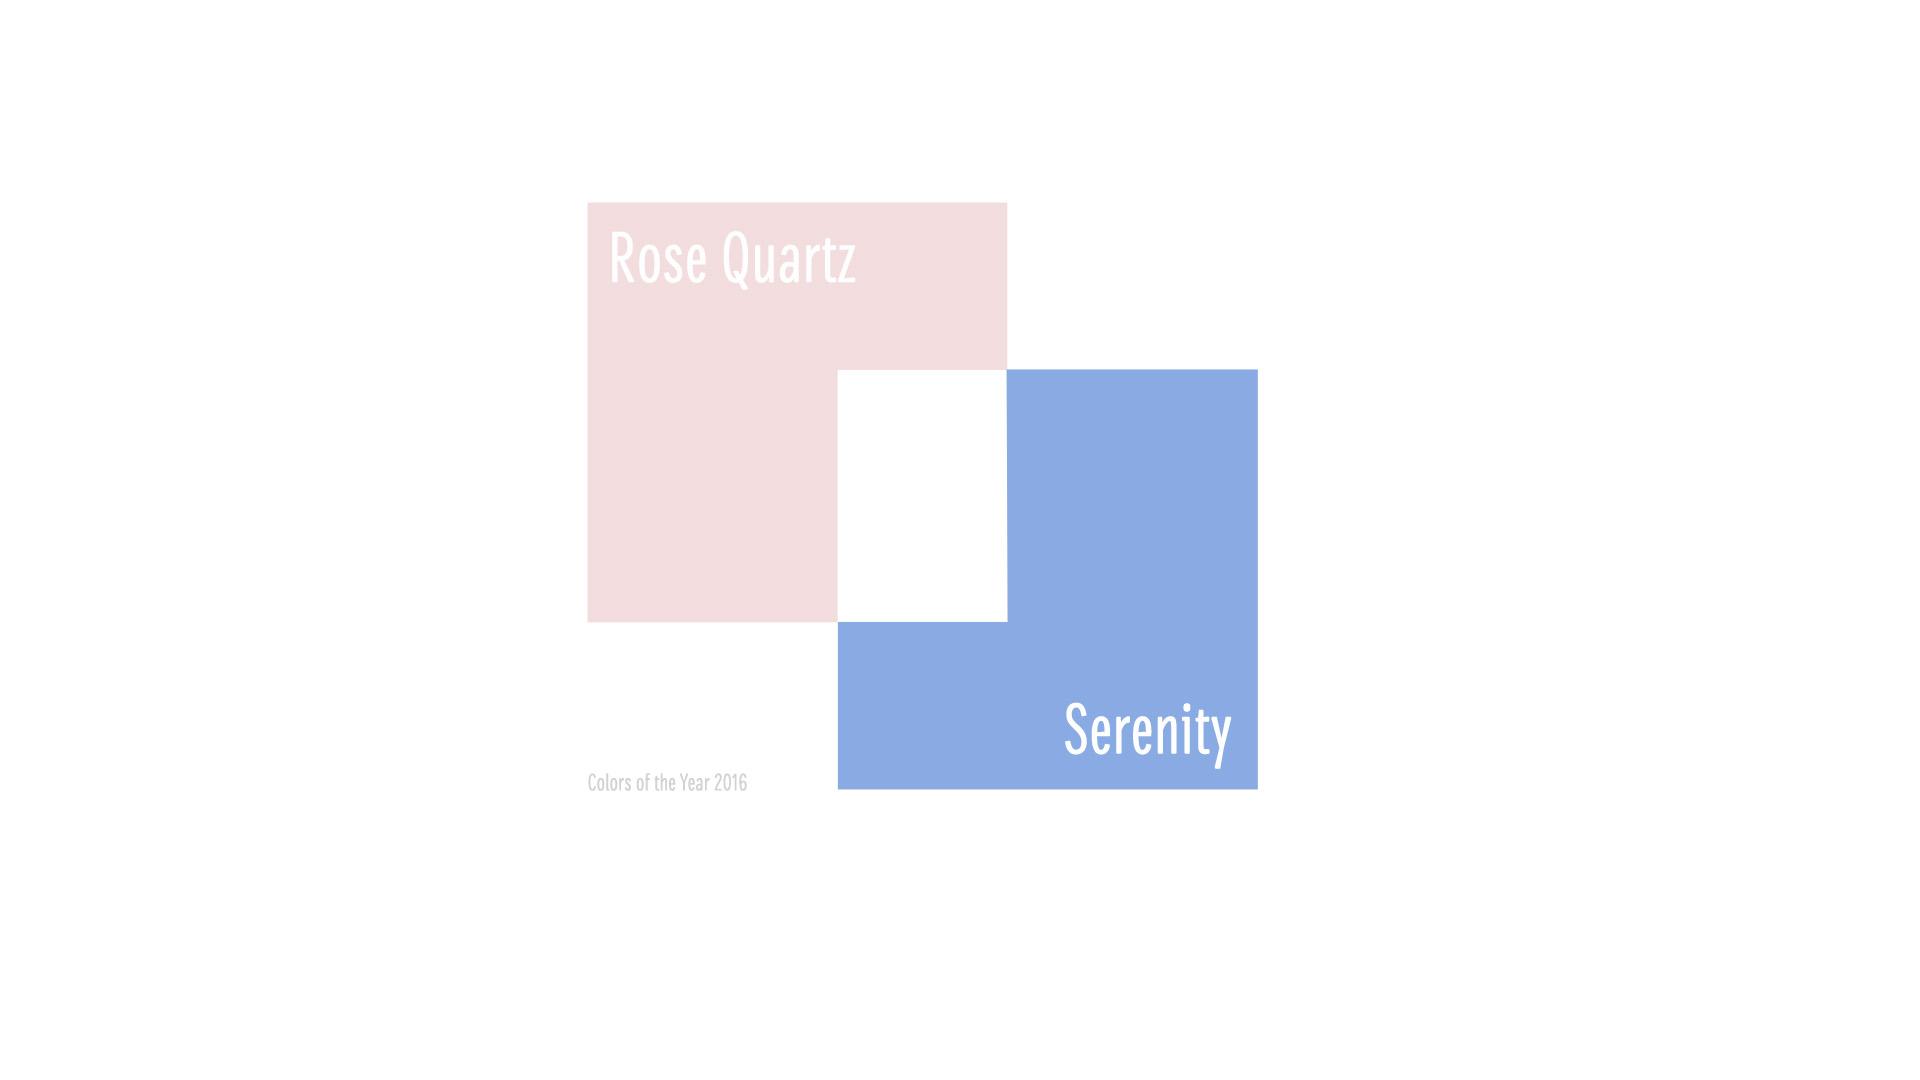 rose quartz serenity 001 hintergrundbild. Black Bedroom Furniture Sets. Home Design Ideas